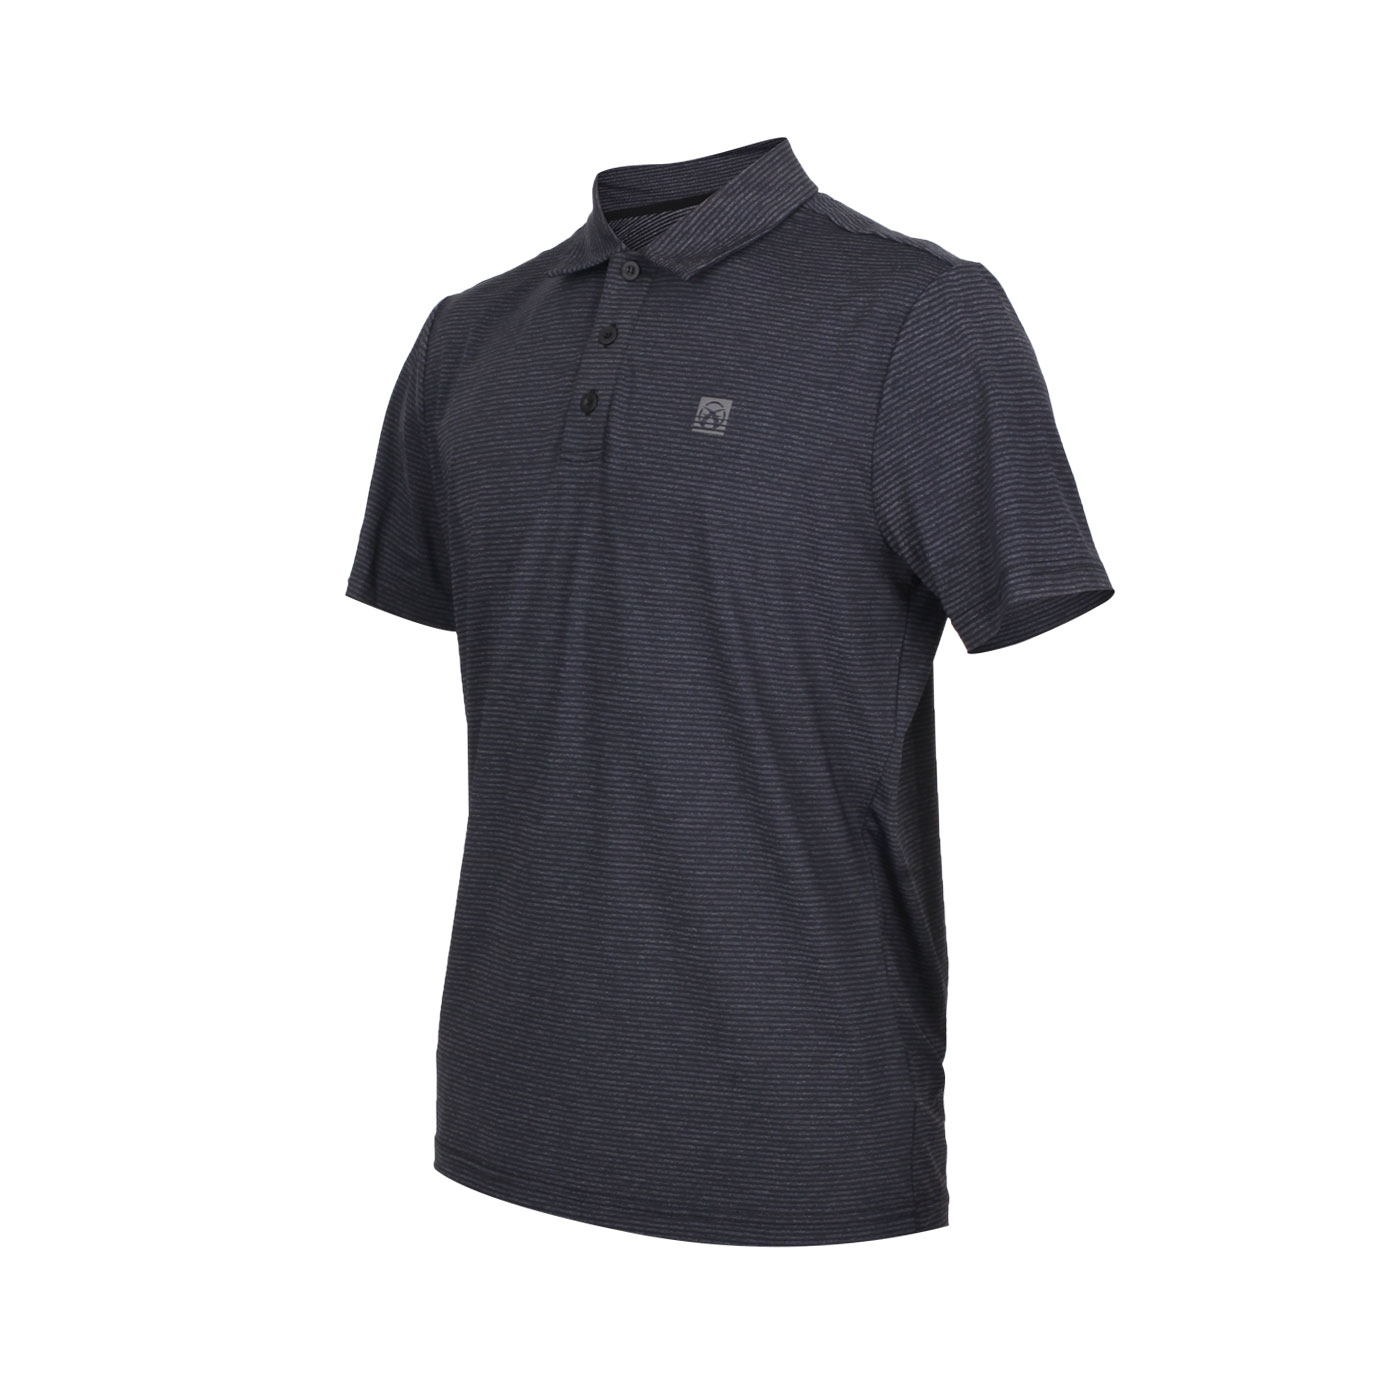 FIRESTAR 男款彈性短袖POLO衫 D0552-18